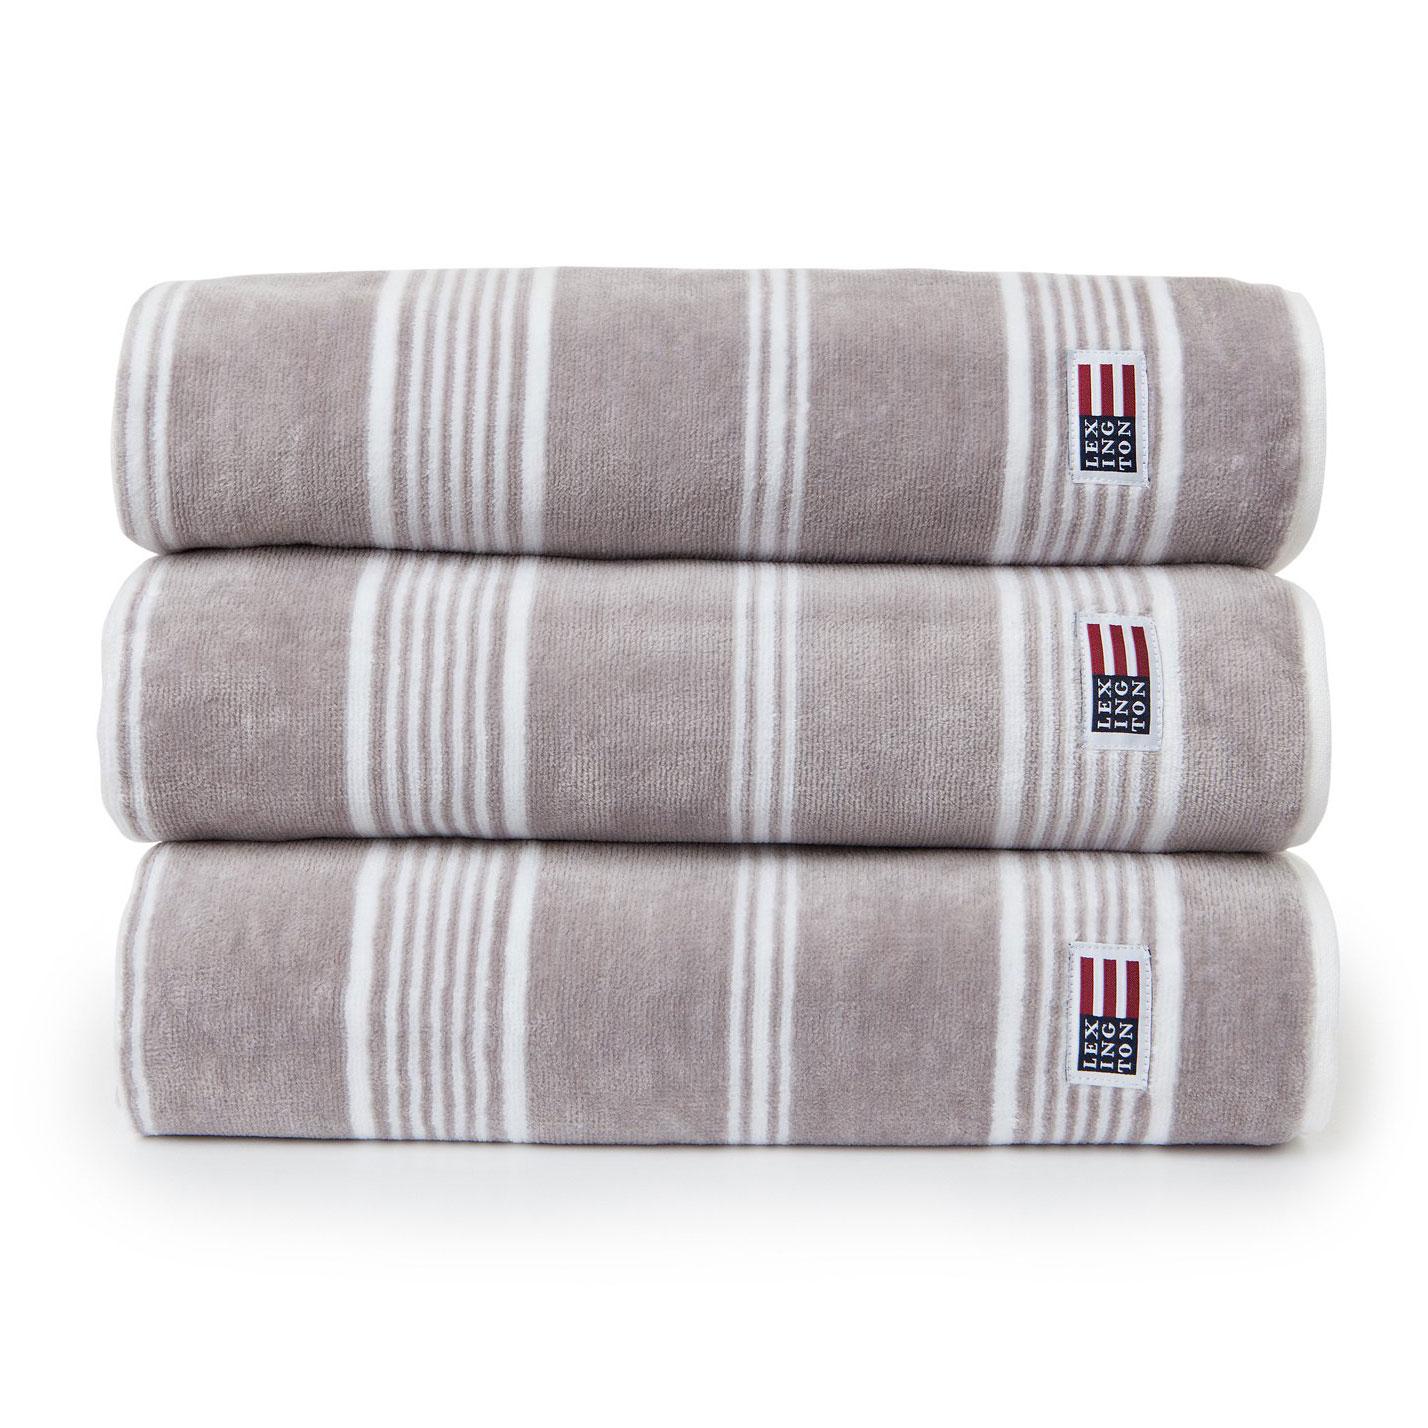 Hand towels   bath towels - Wide range online  631543718d635